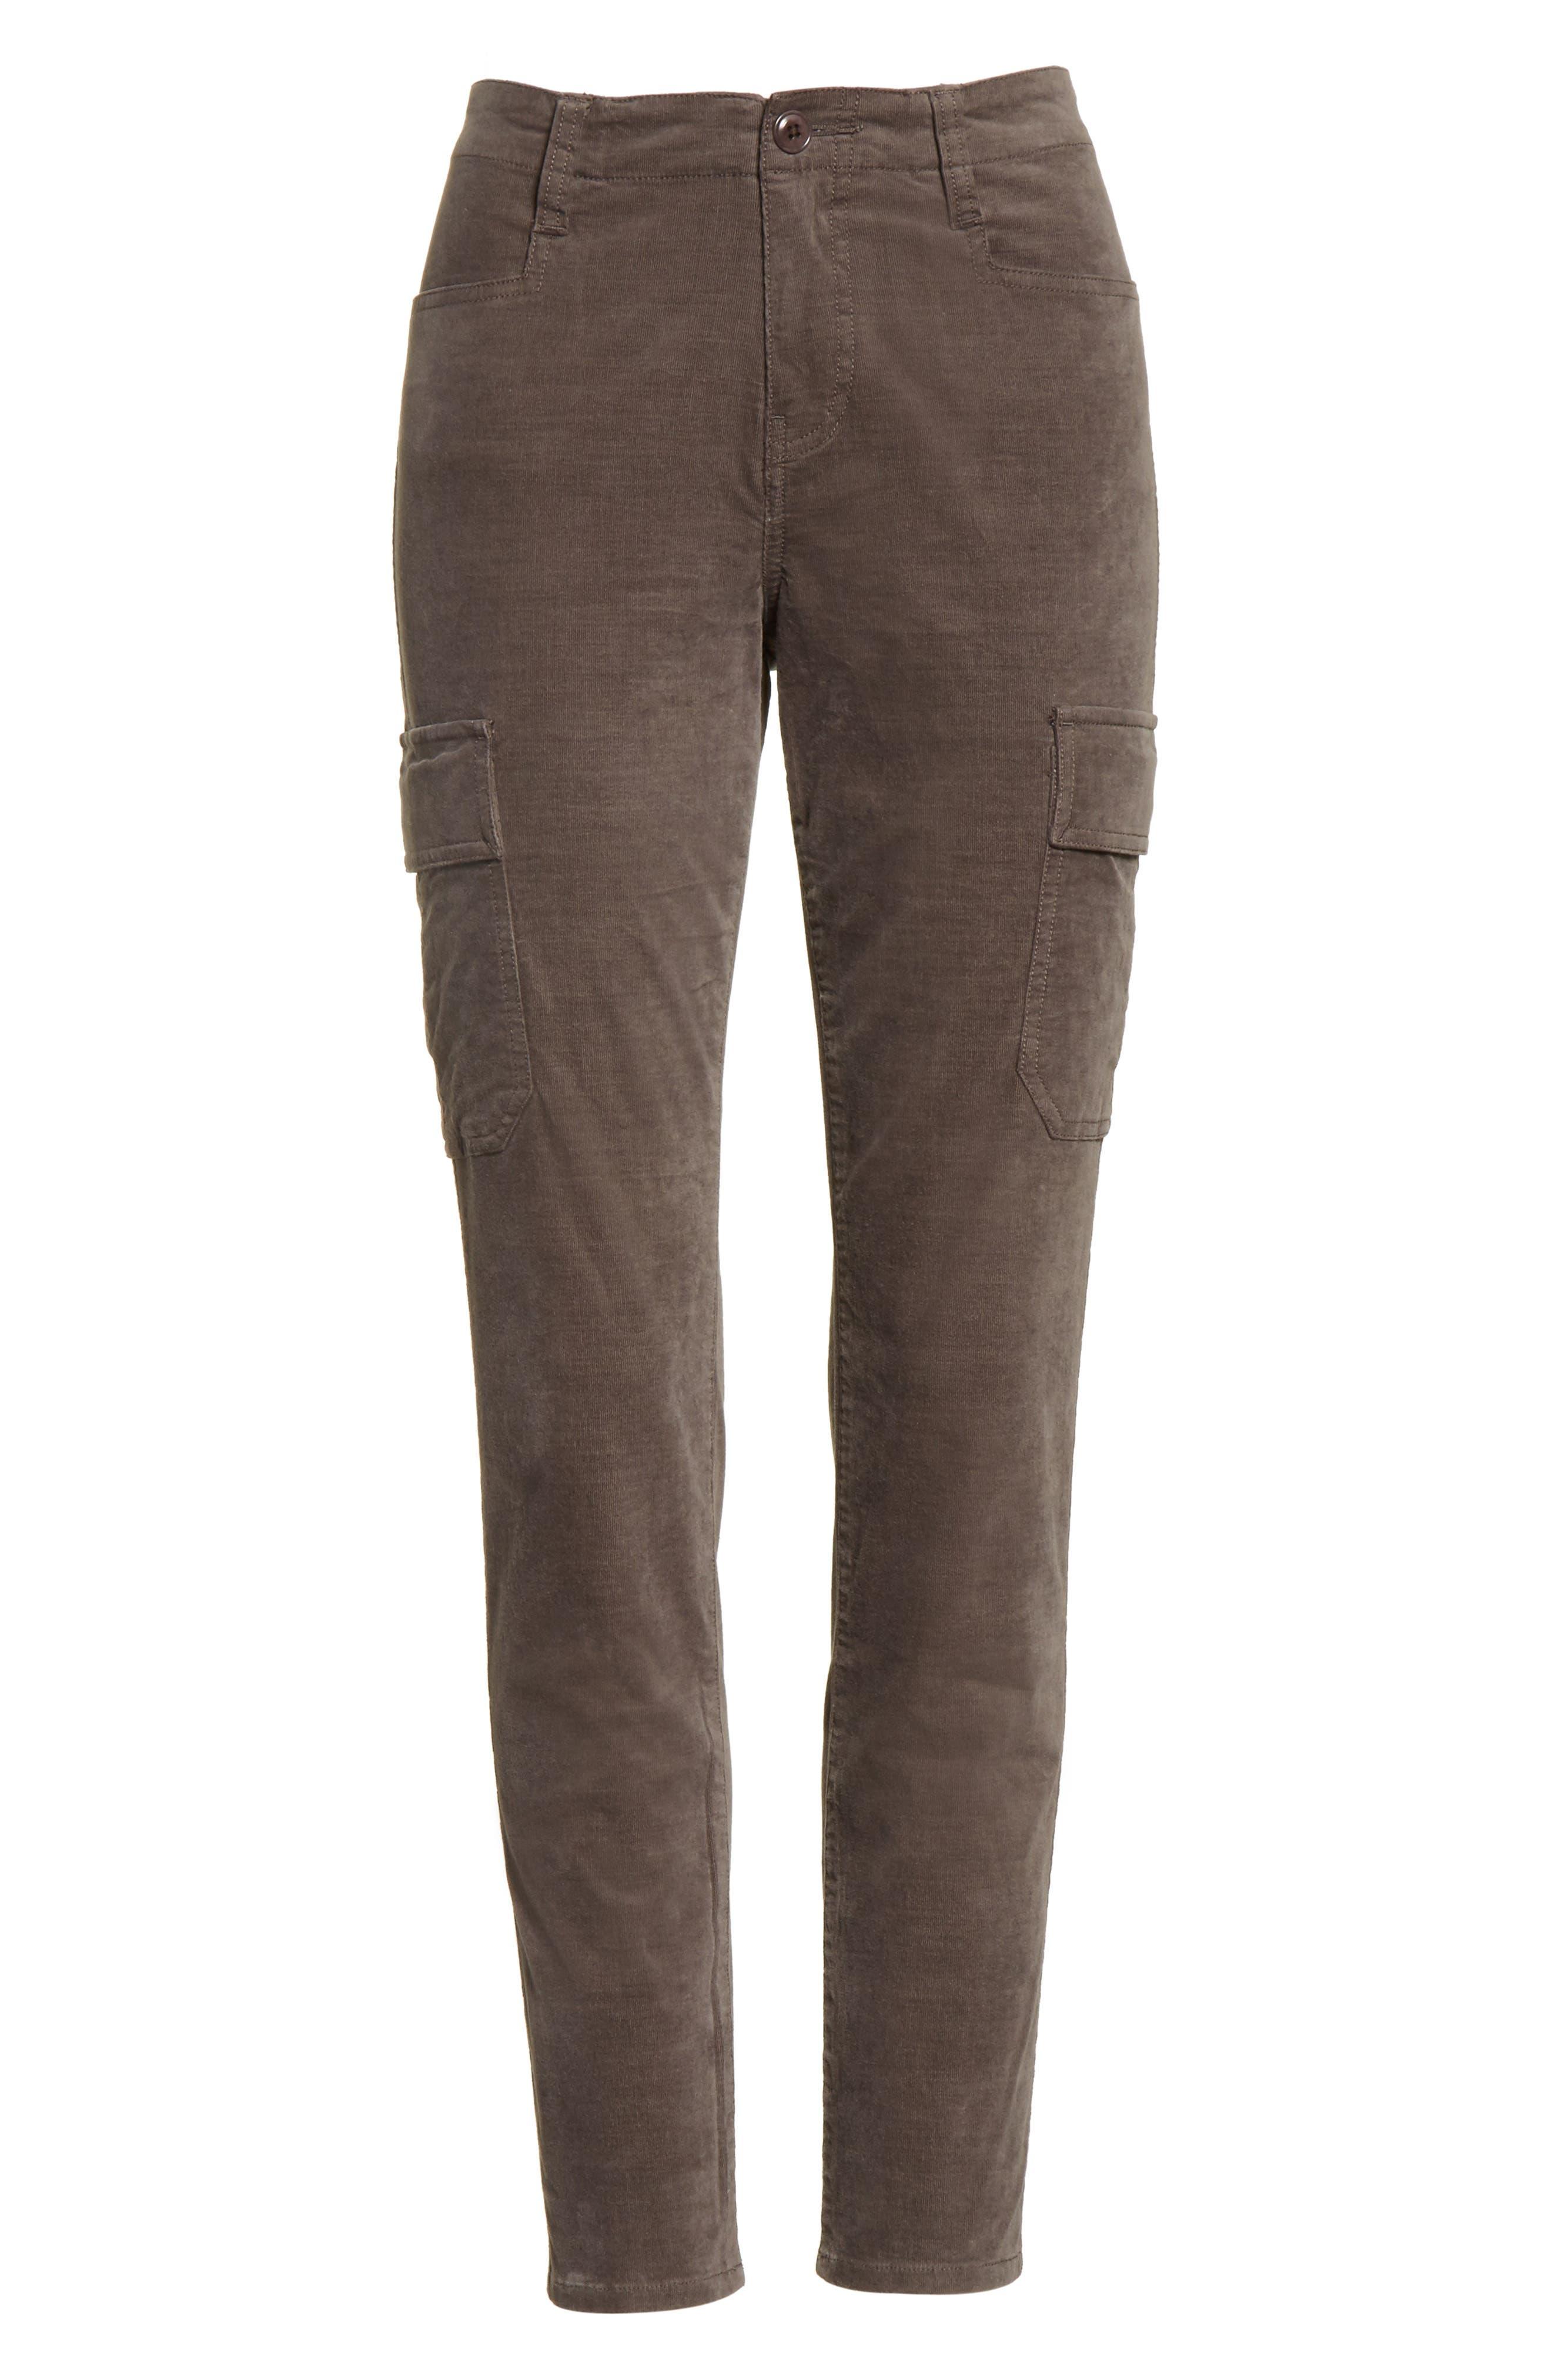 Skinny Corduroy Cargo Pants,                             Alternate thumbnail 11, color,